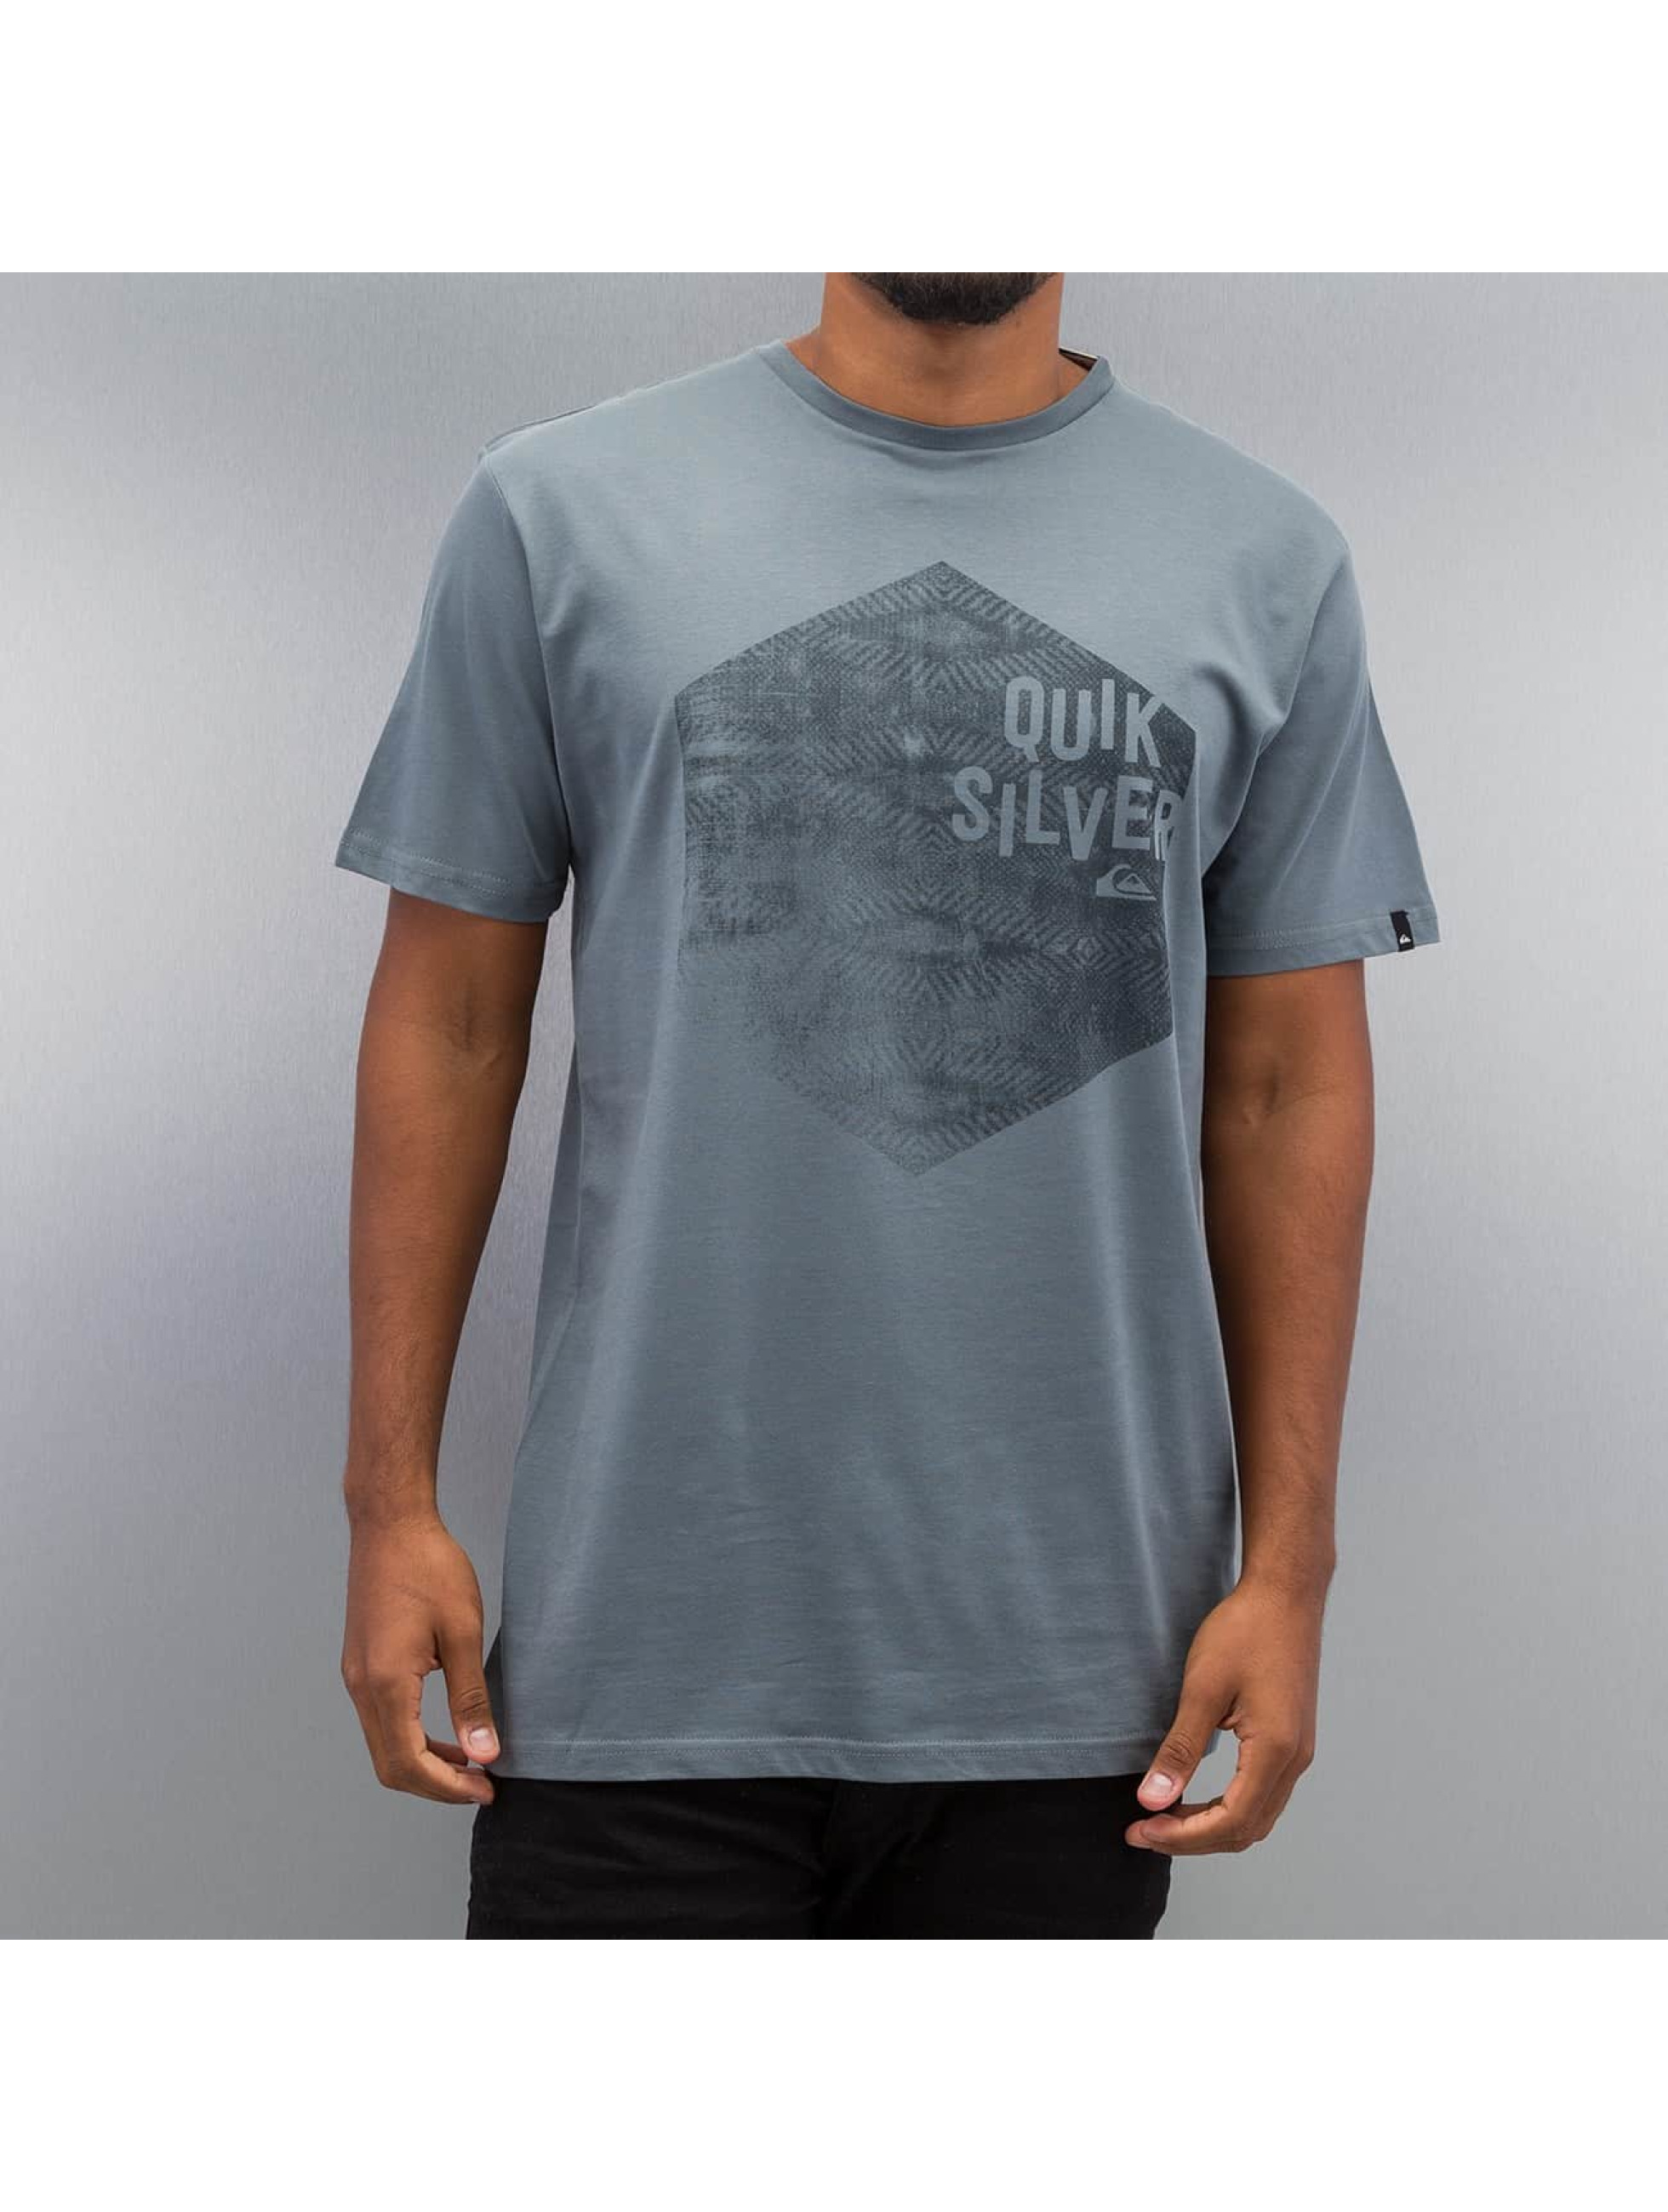 Quiksilver T-paidat Jumbled sininen